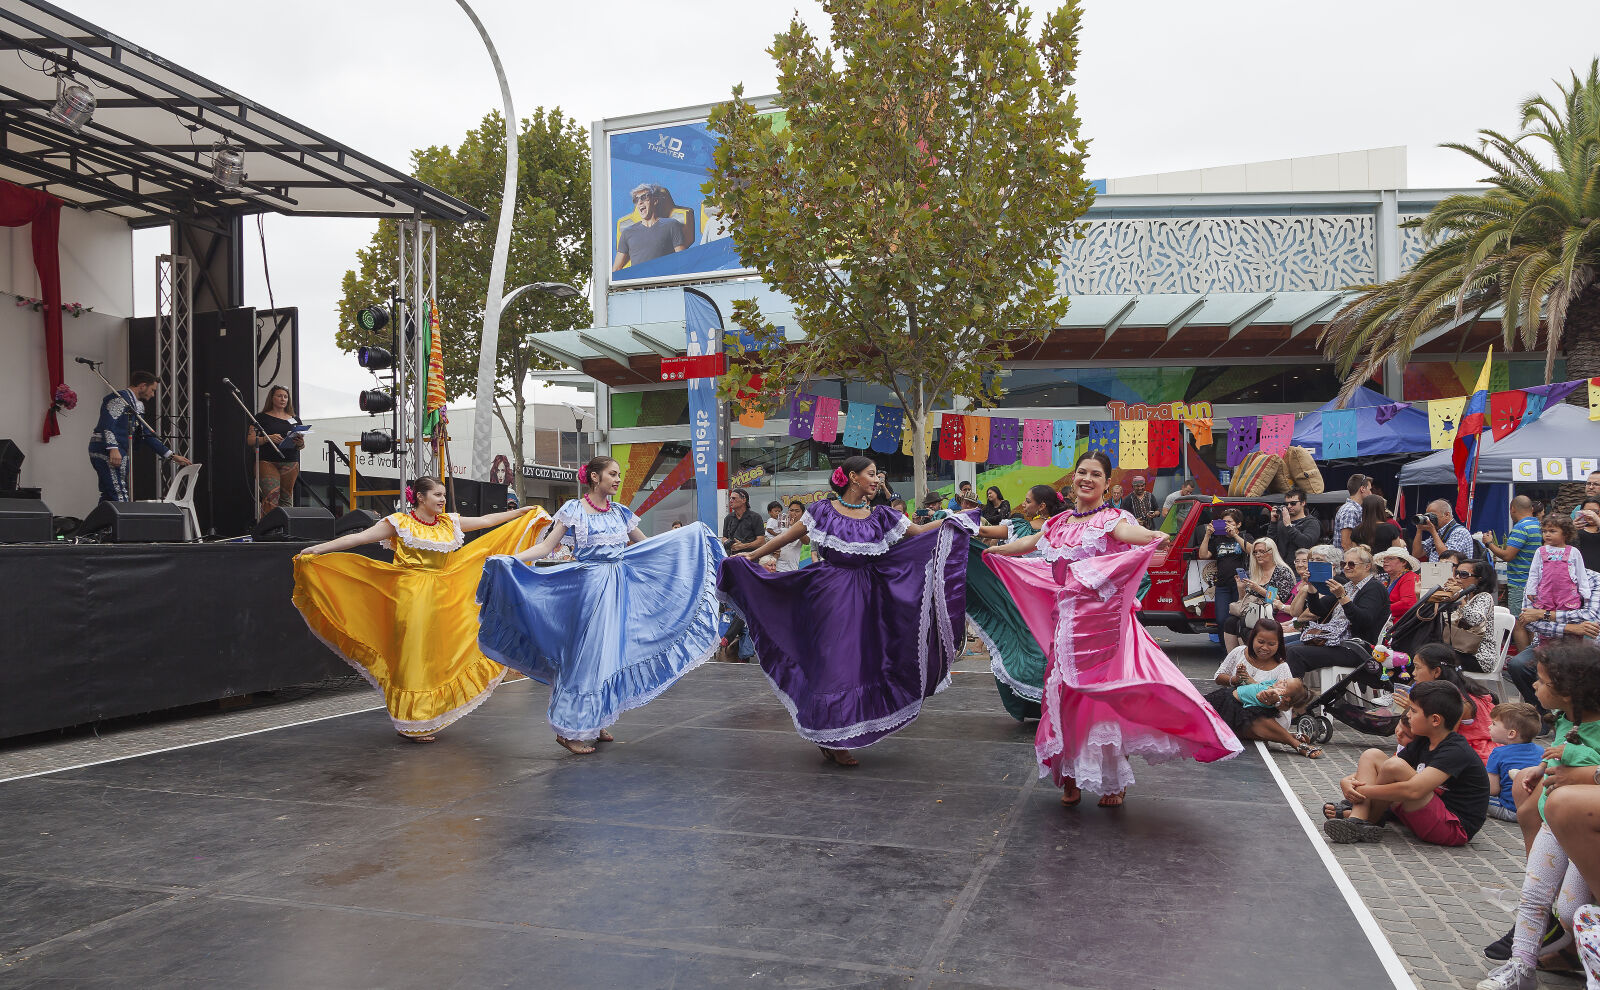 dancer, dresses, festival, mexican